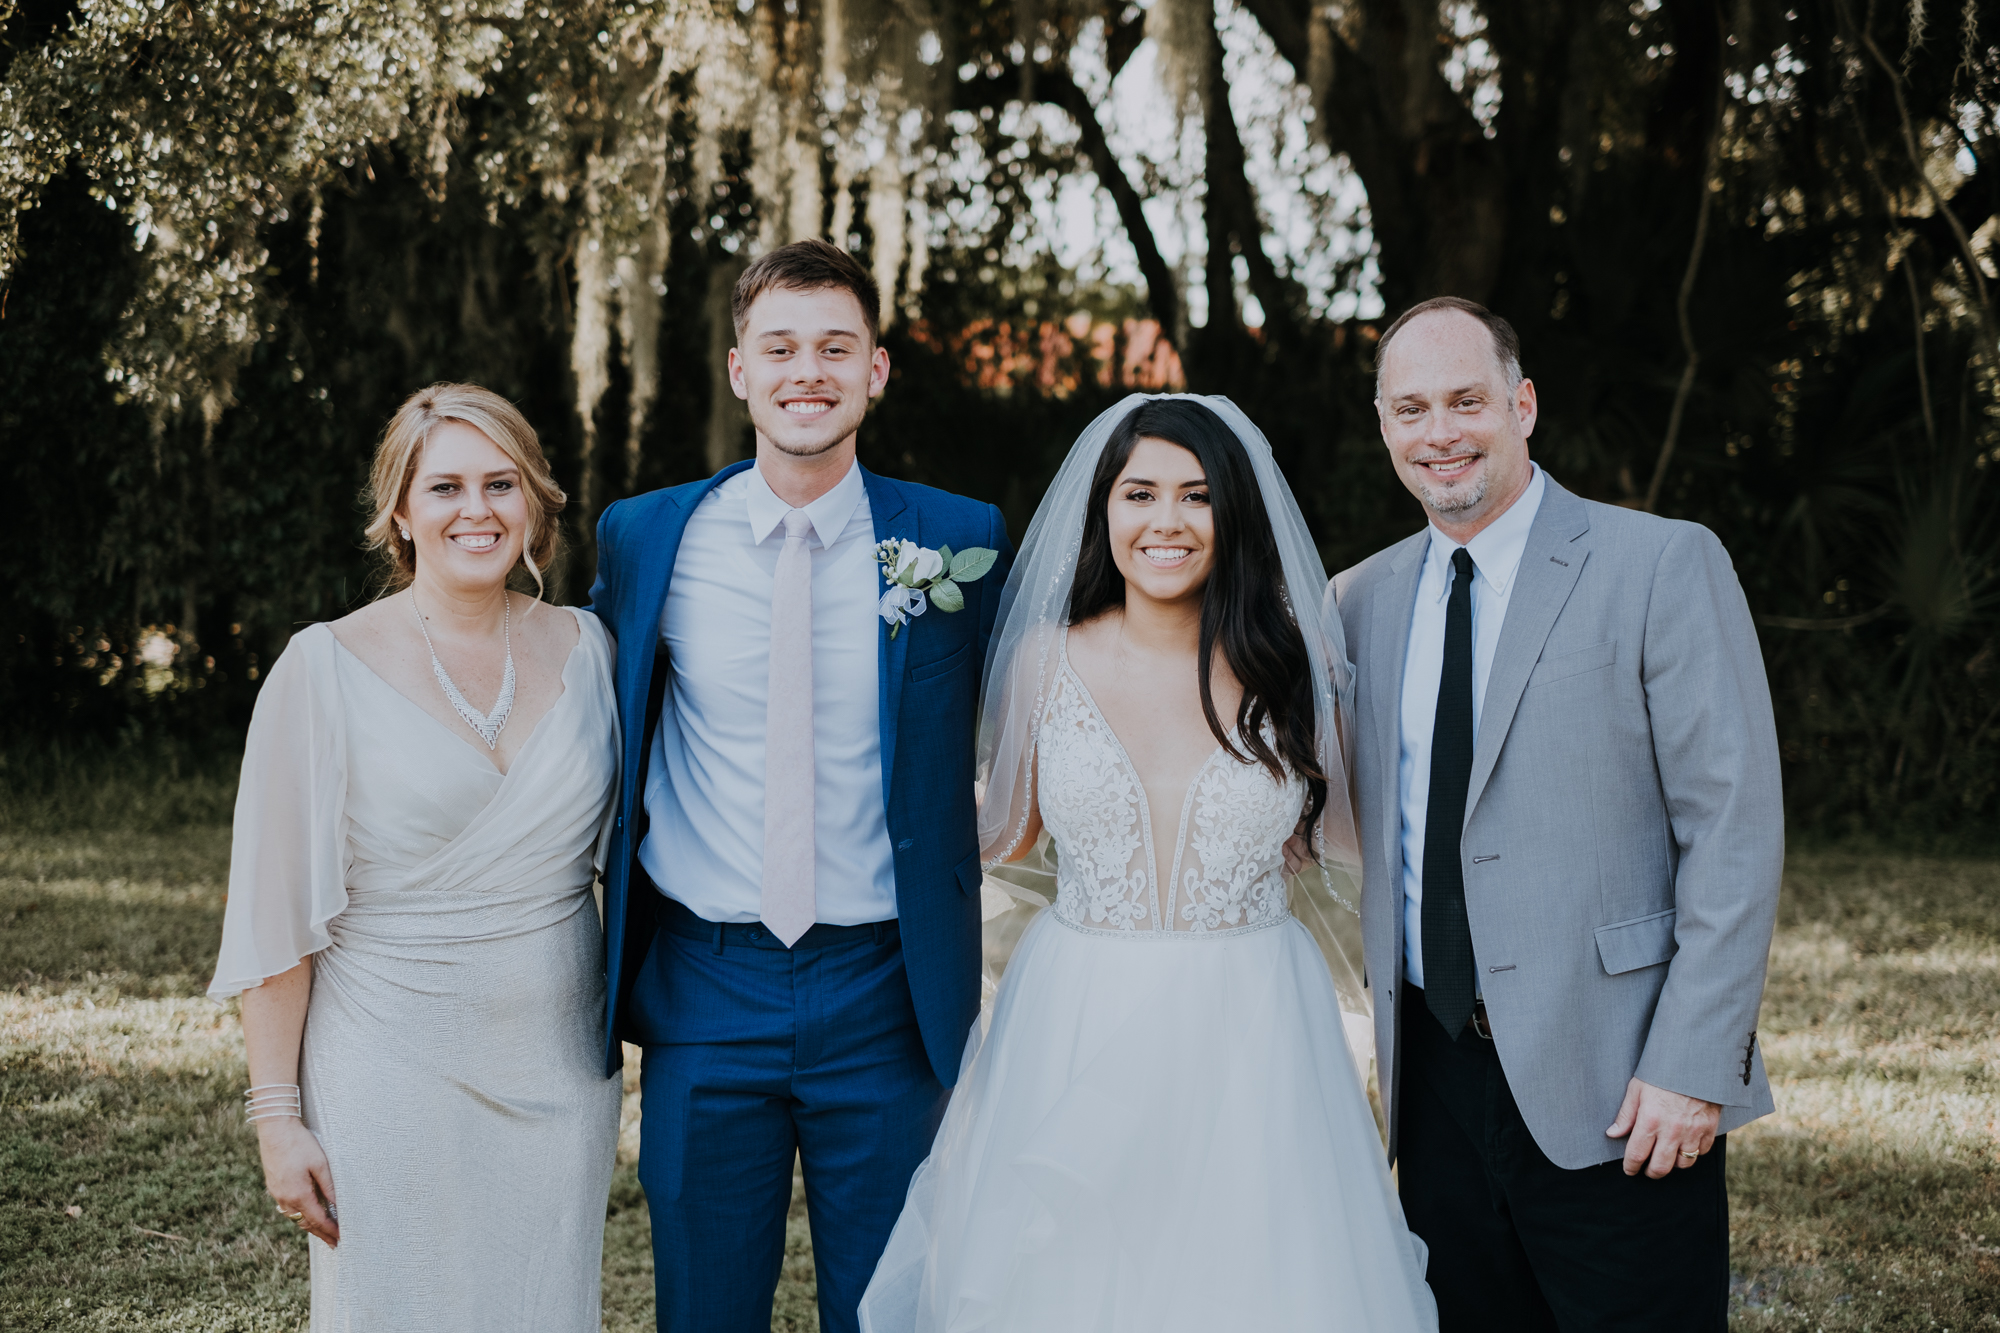 wedding family portraits | group wedding portraits | outdoor Florida wedding